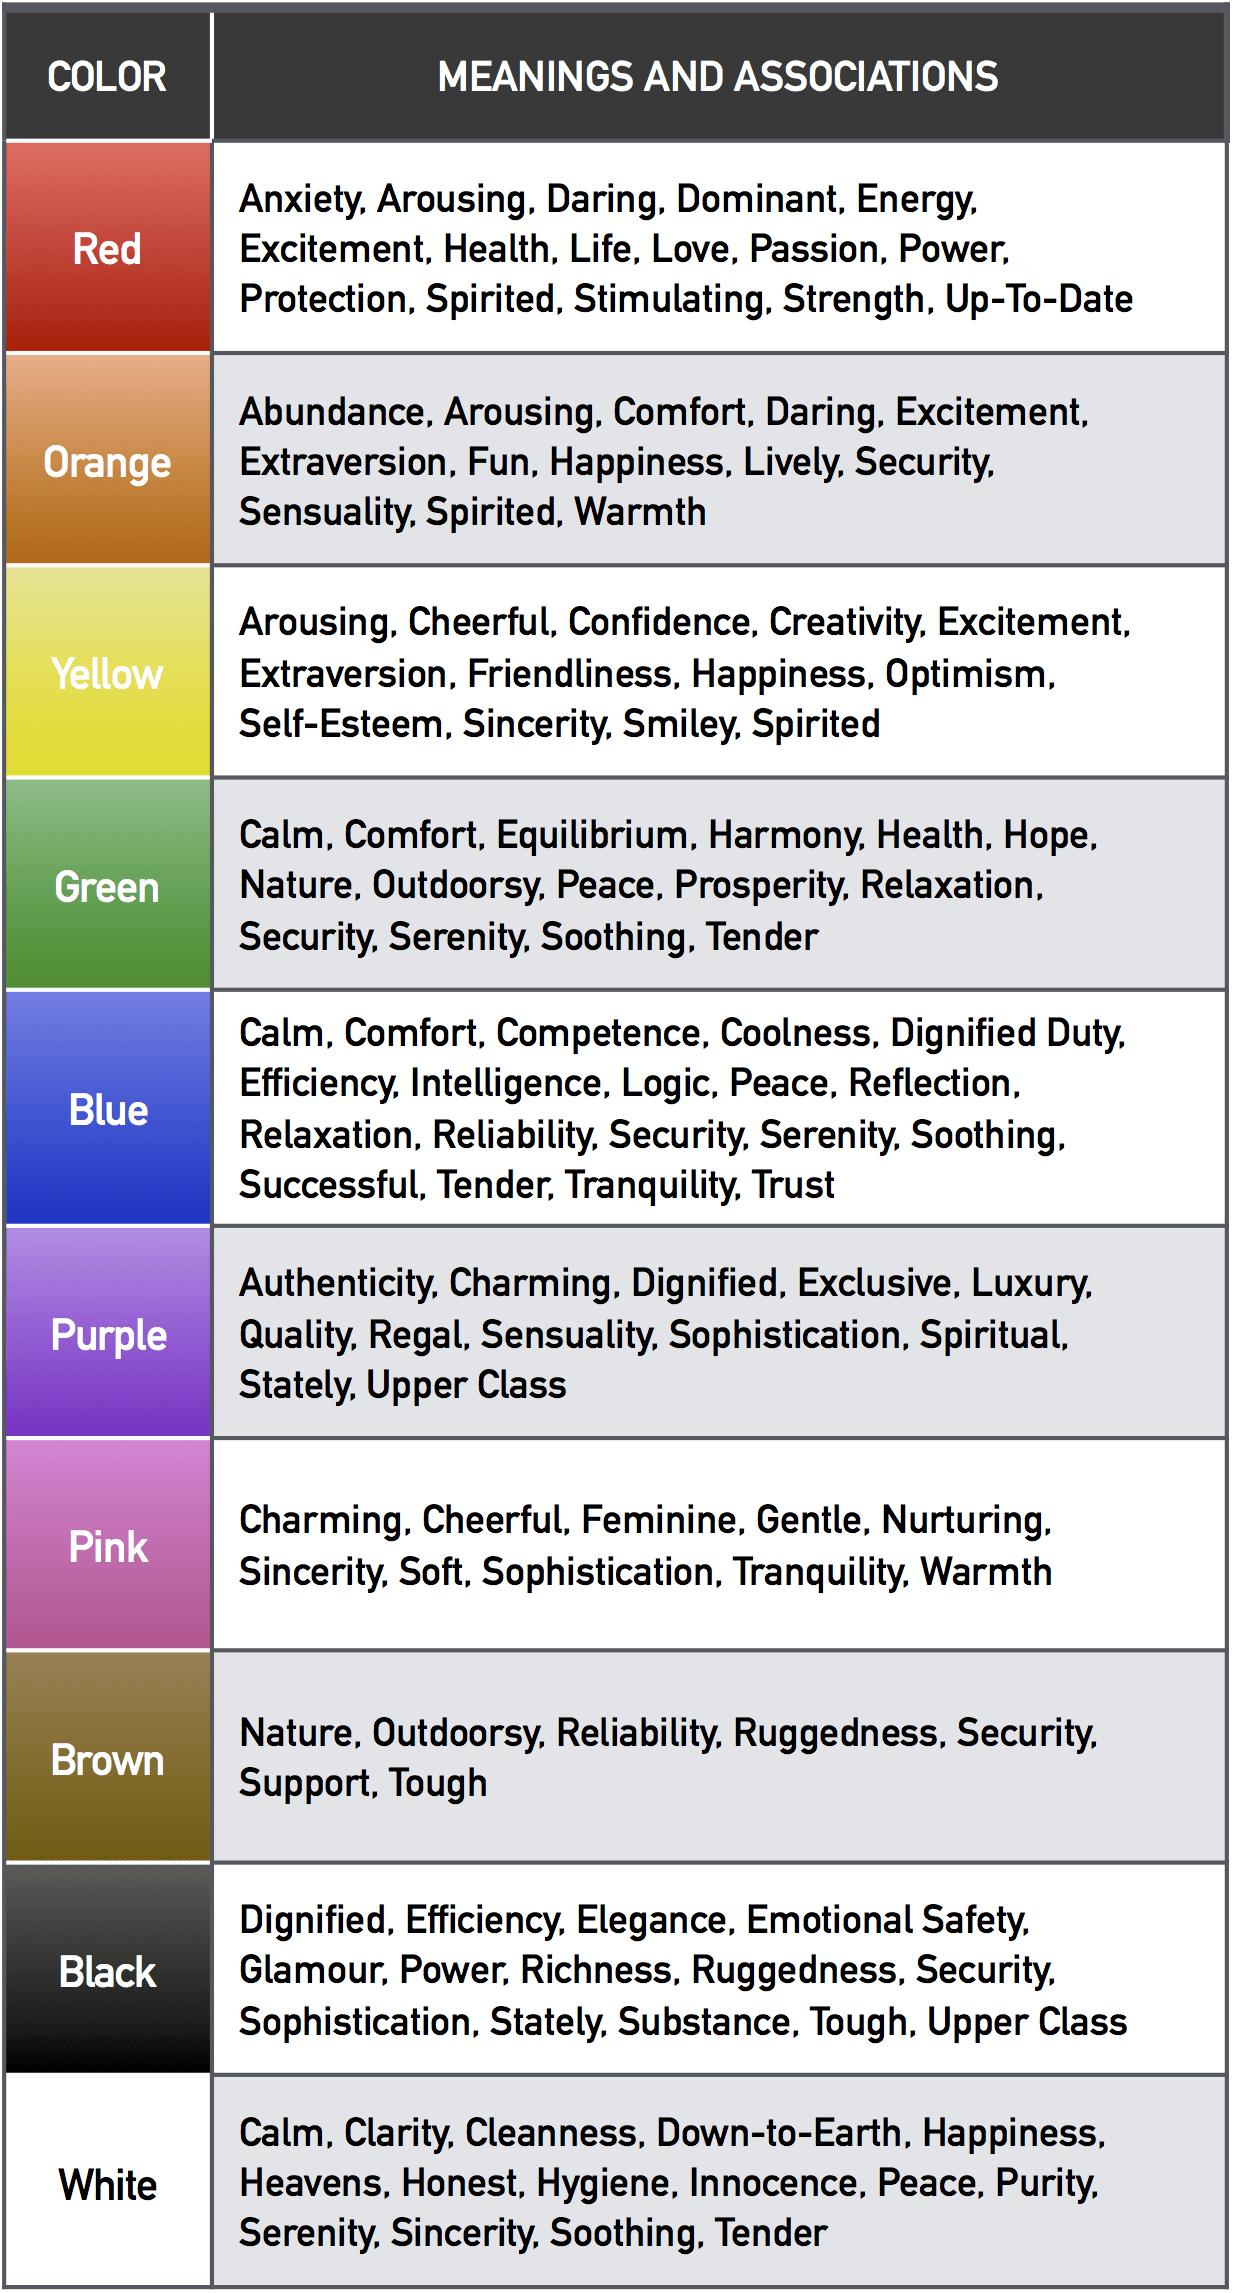 An Enormous Guide To Color Psychology Via Nick Kolenda